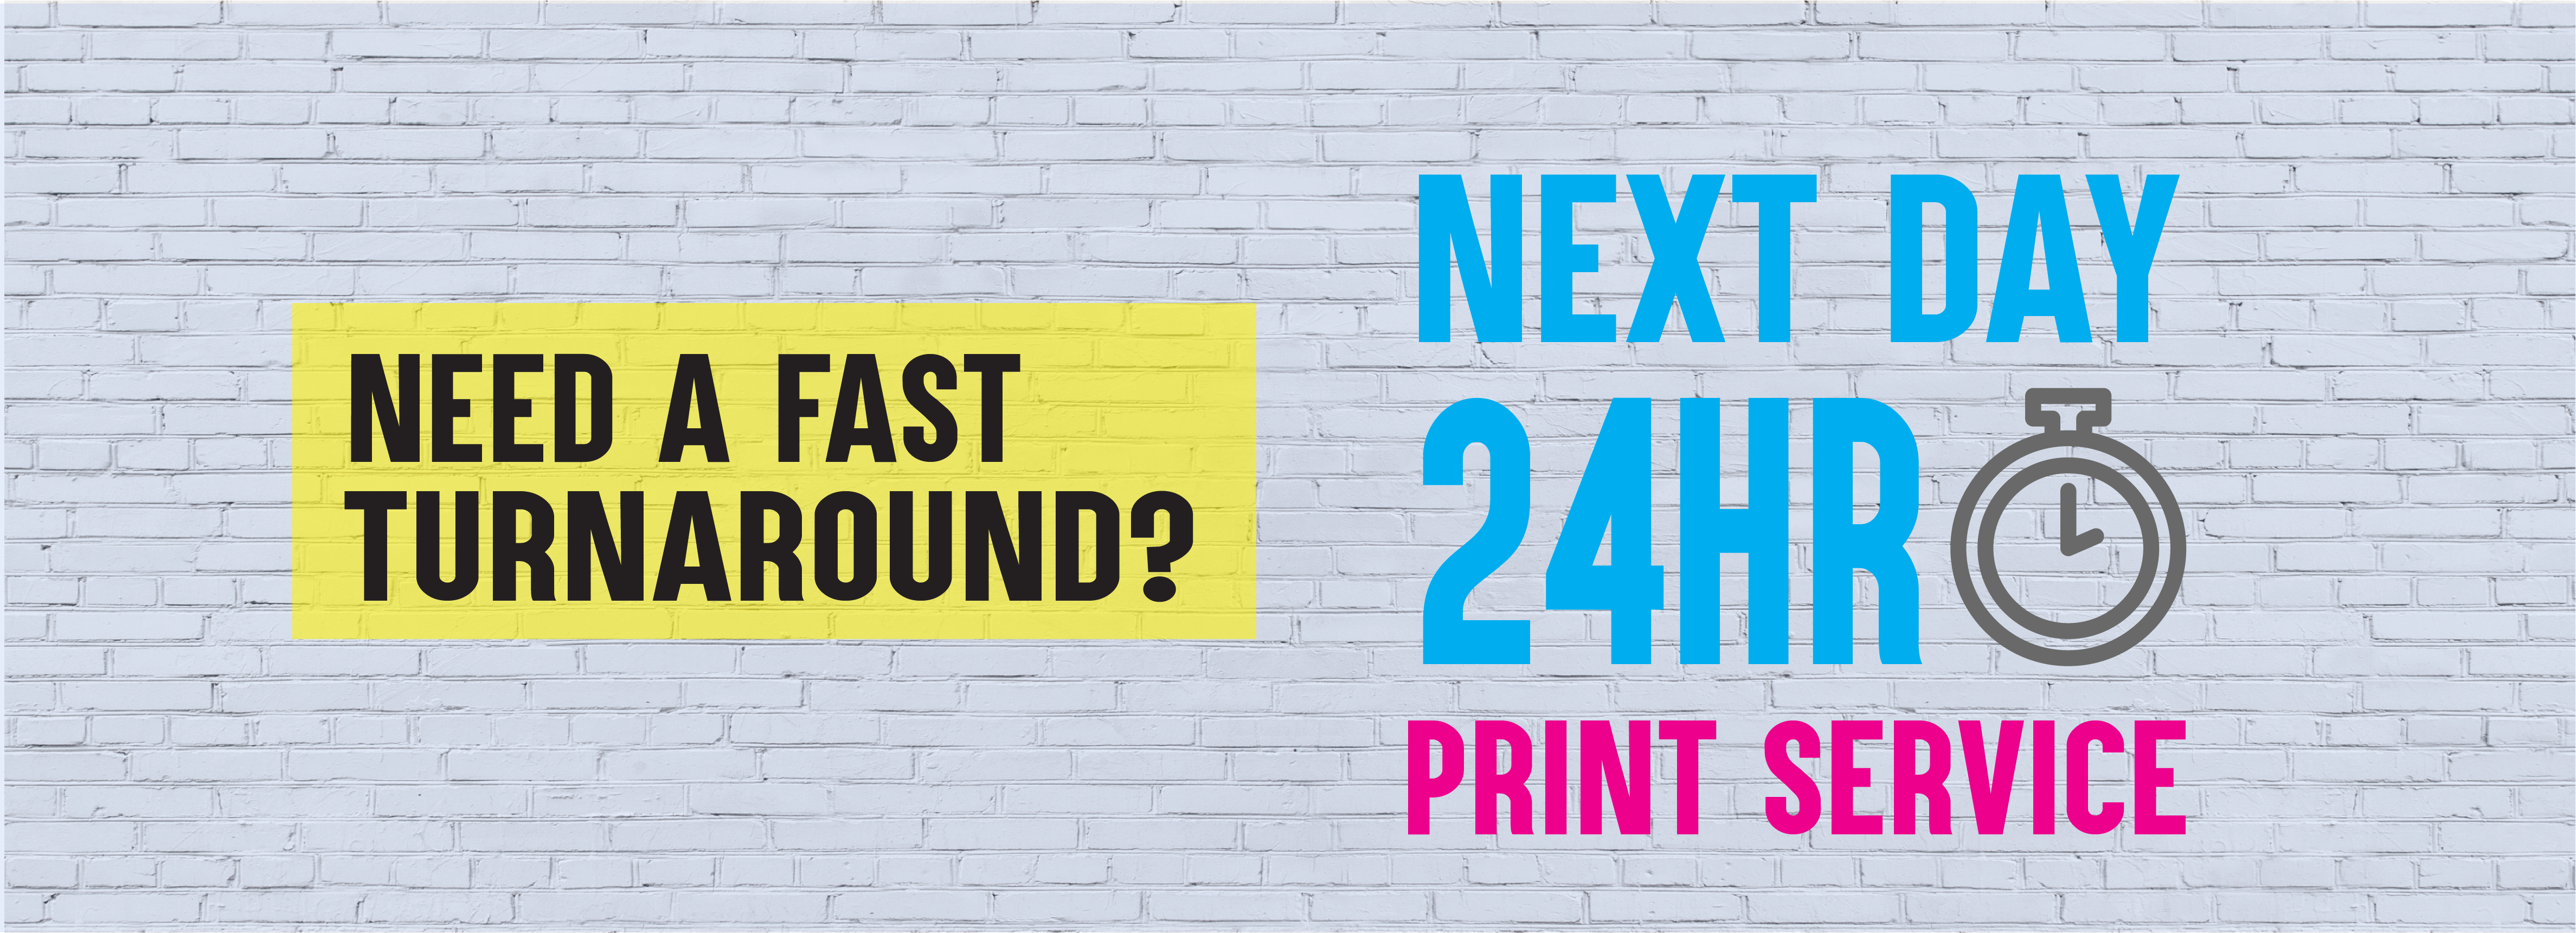 24 HR Print Service